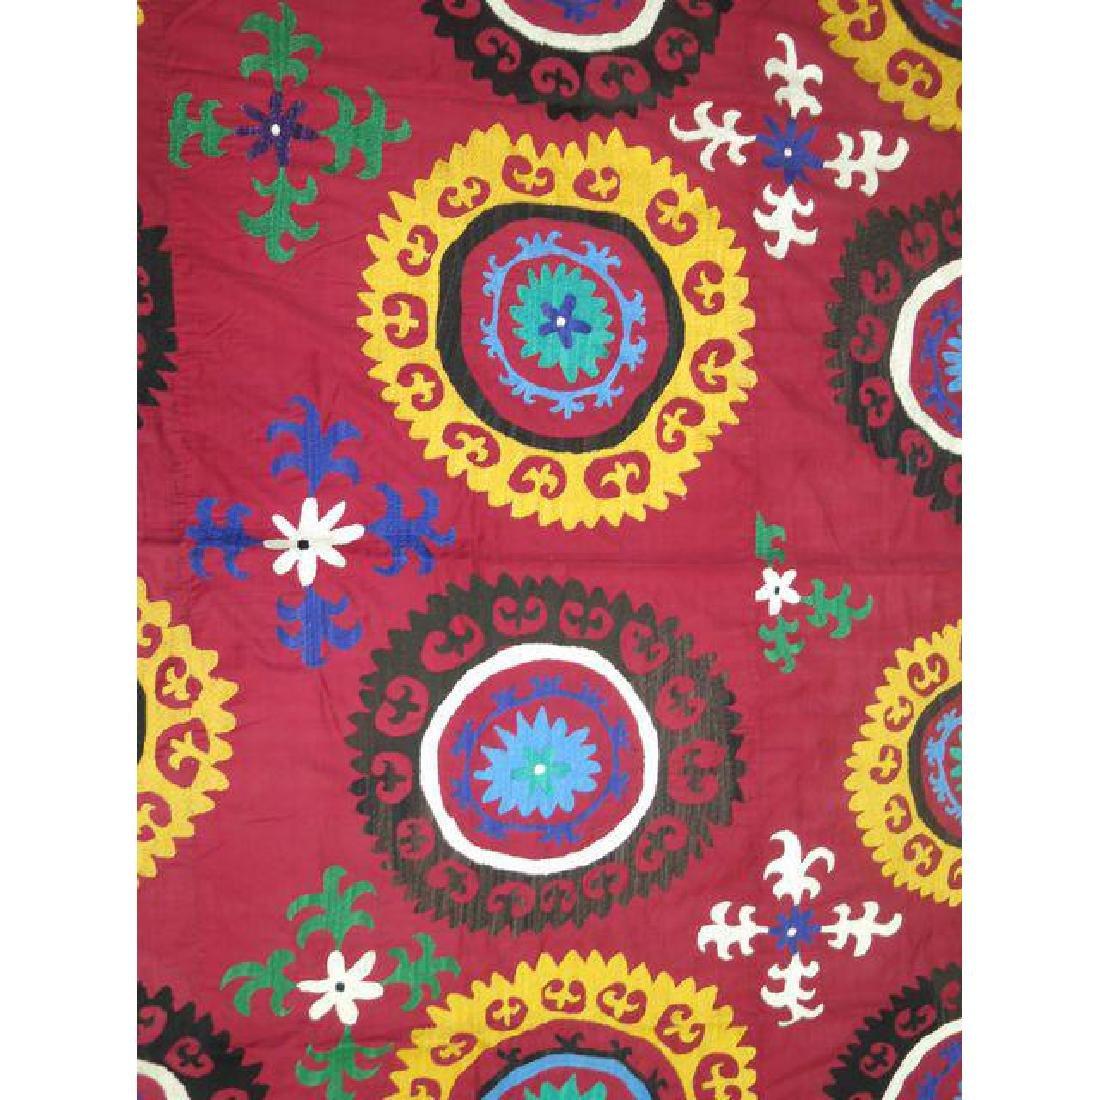 Vintage Suzanni Embroidery Throw 6.10x7.5 - 3